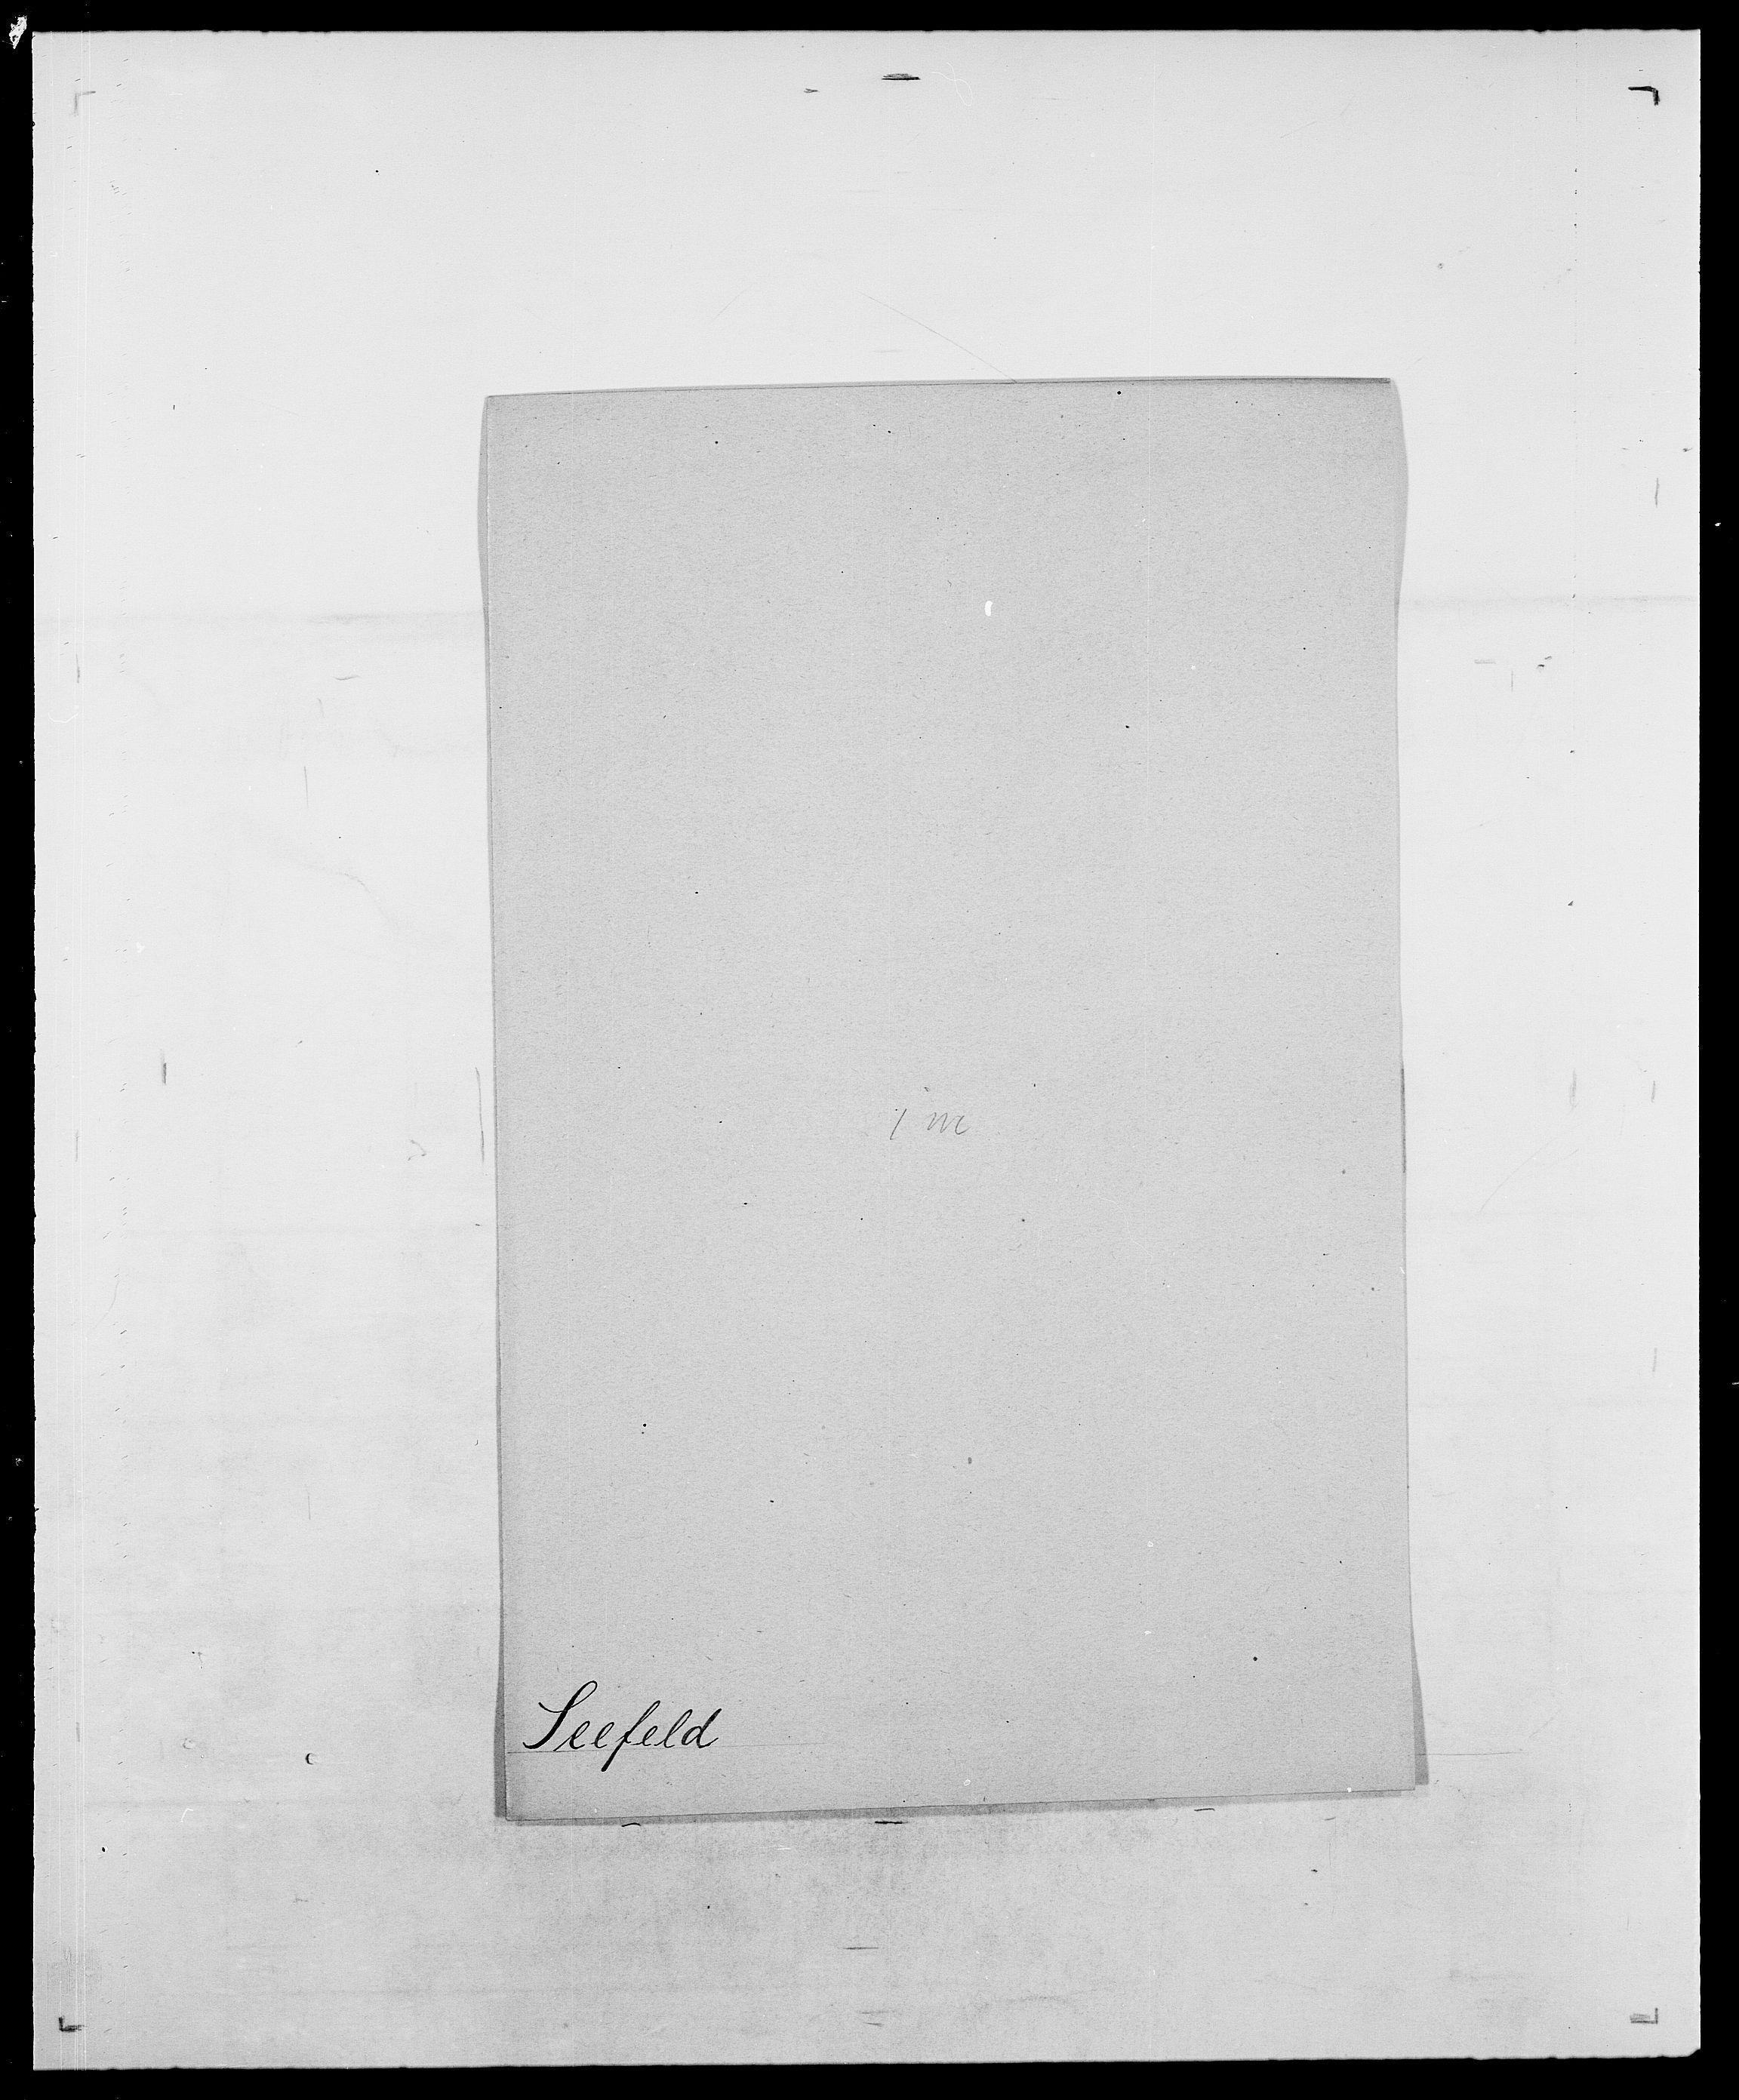 SAO, Delgobe, Charles Antoine - samling, D/Da/L0035: Schnabel - sjetman, s. 537